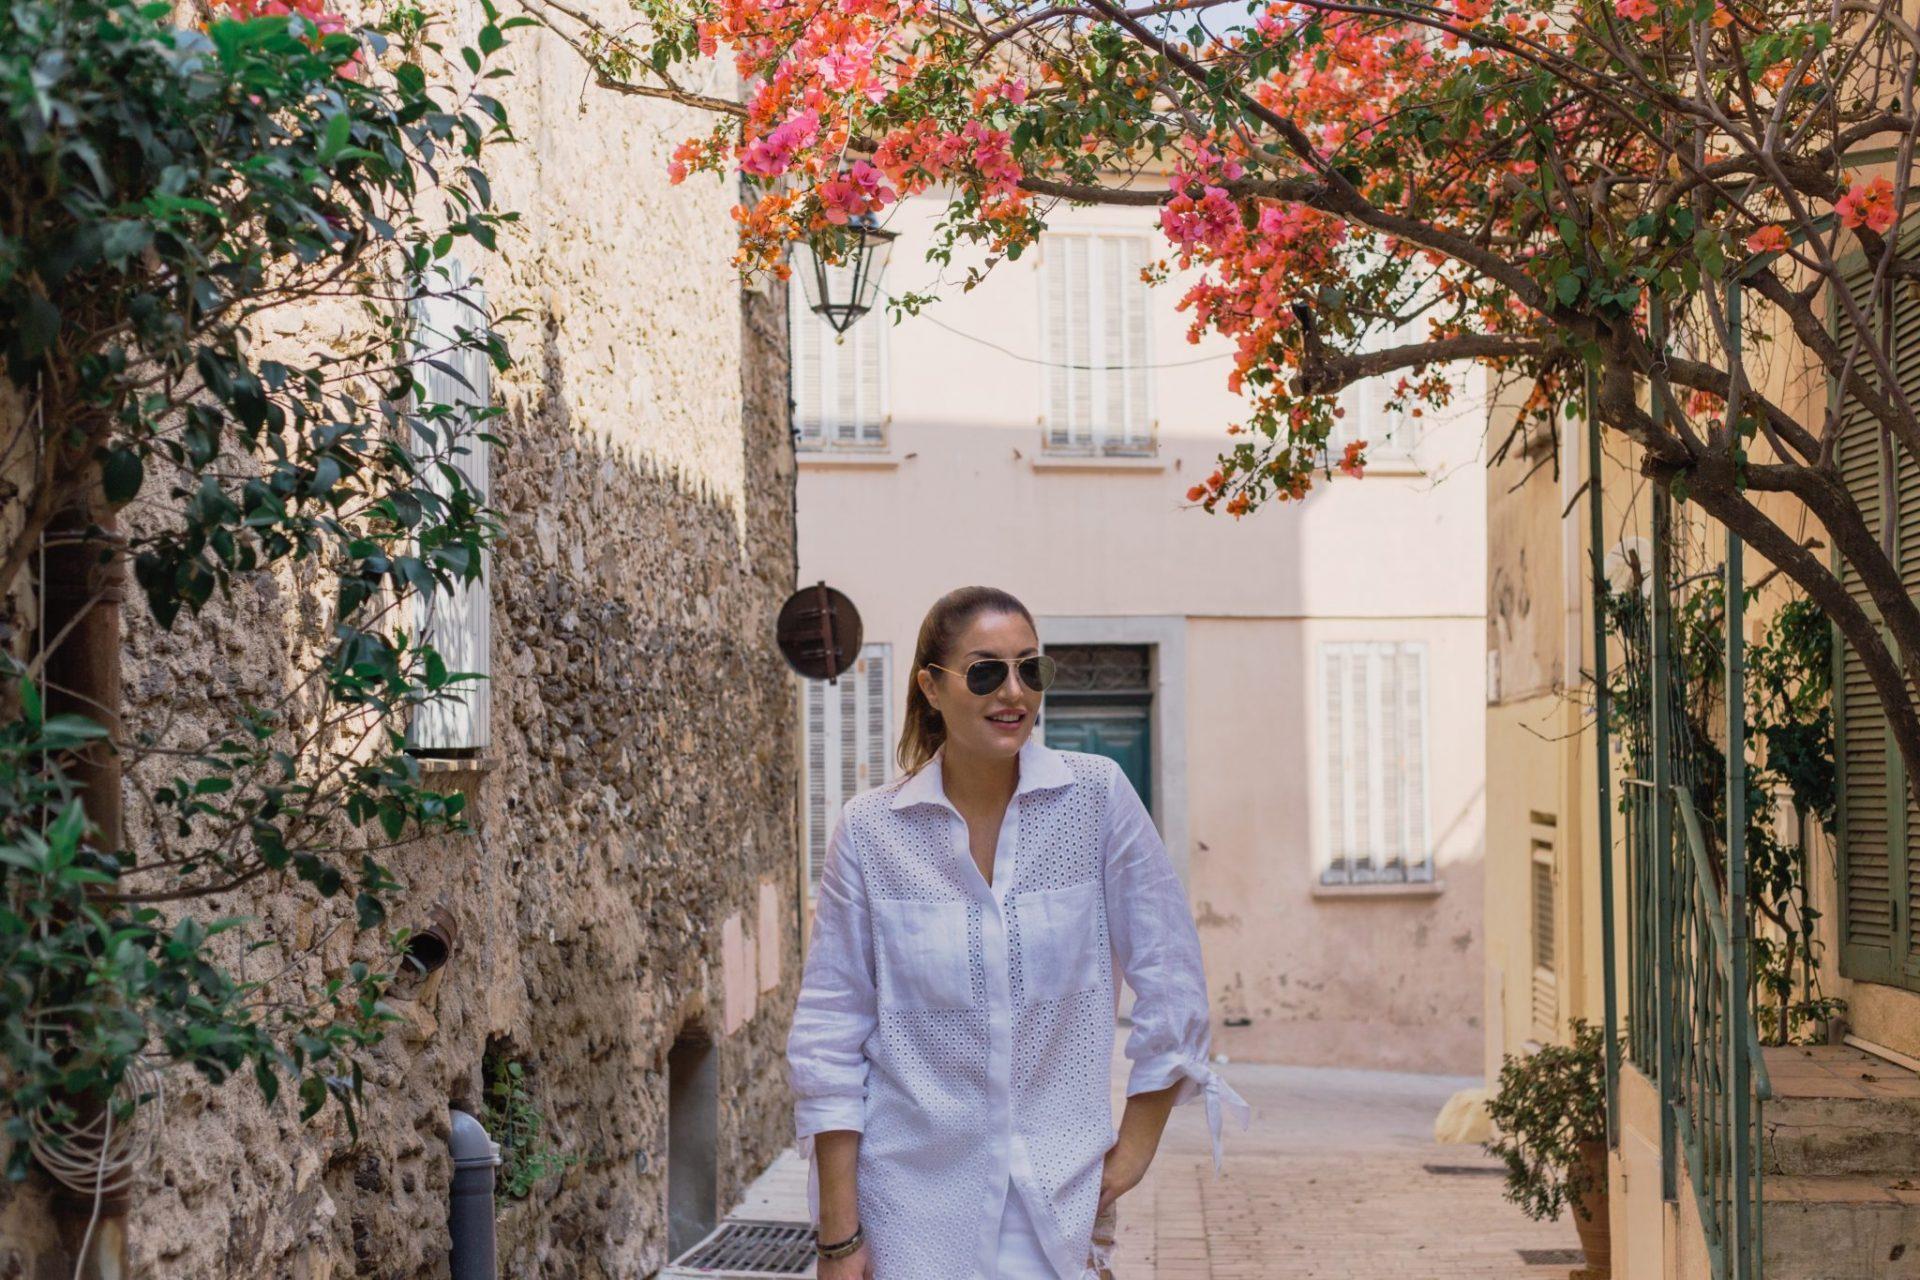 St Tropez exploring cobblestone streets